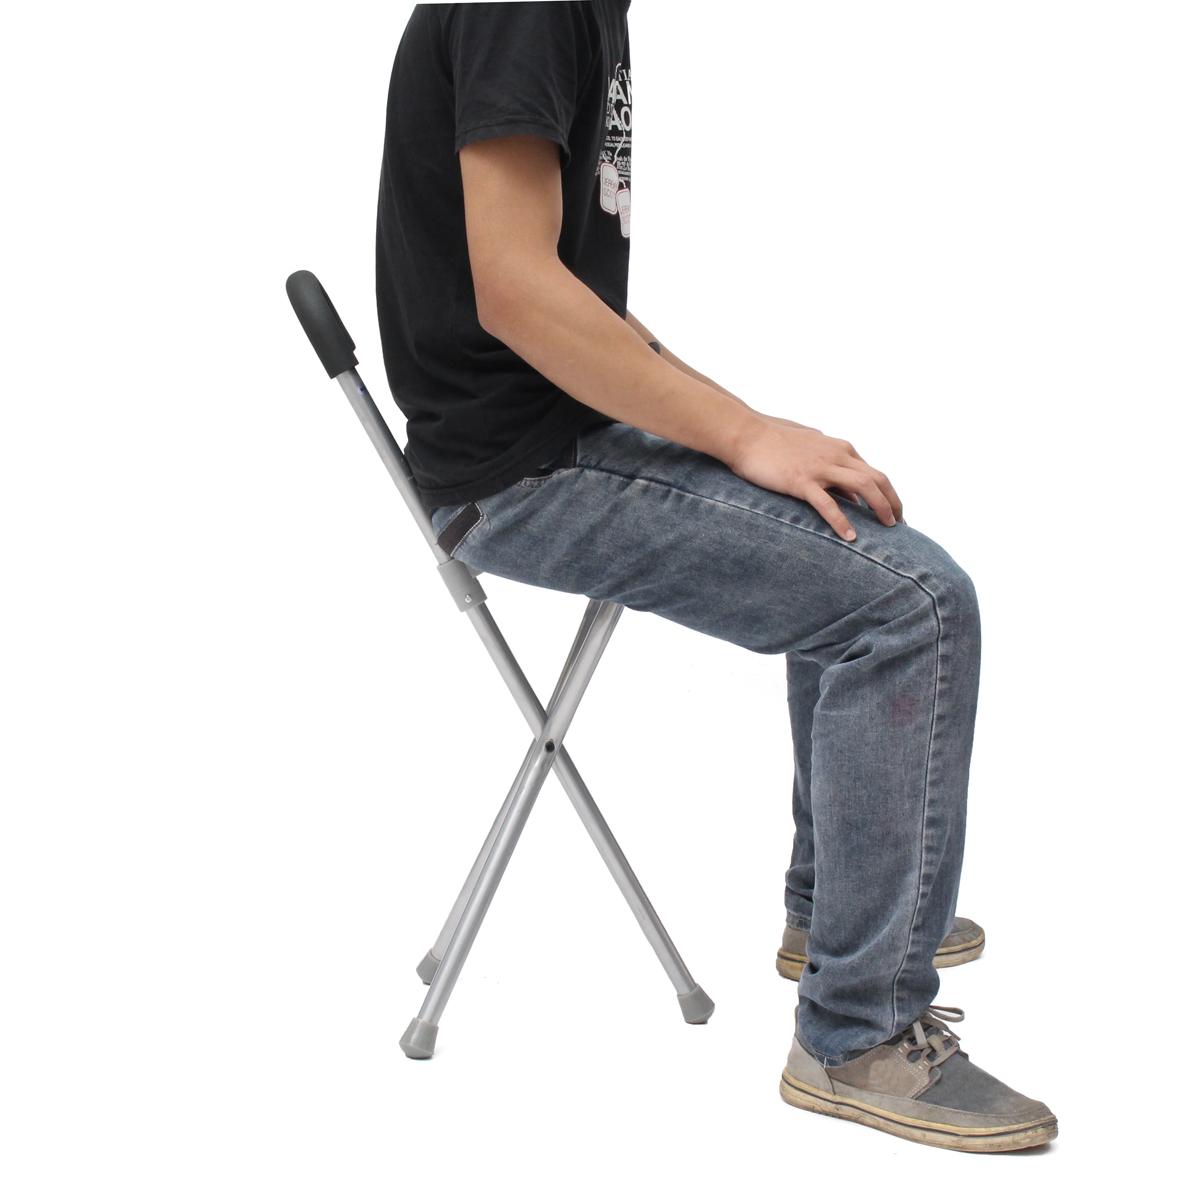 2b63127cf81e Outdoor Travel Folding Stool Chair Portable Tripod Cane Walking Stick Seat  Camping Hiking